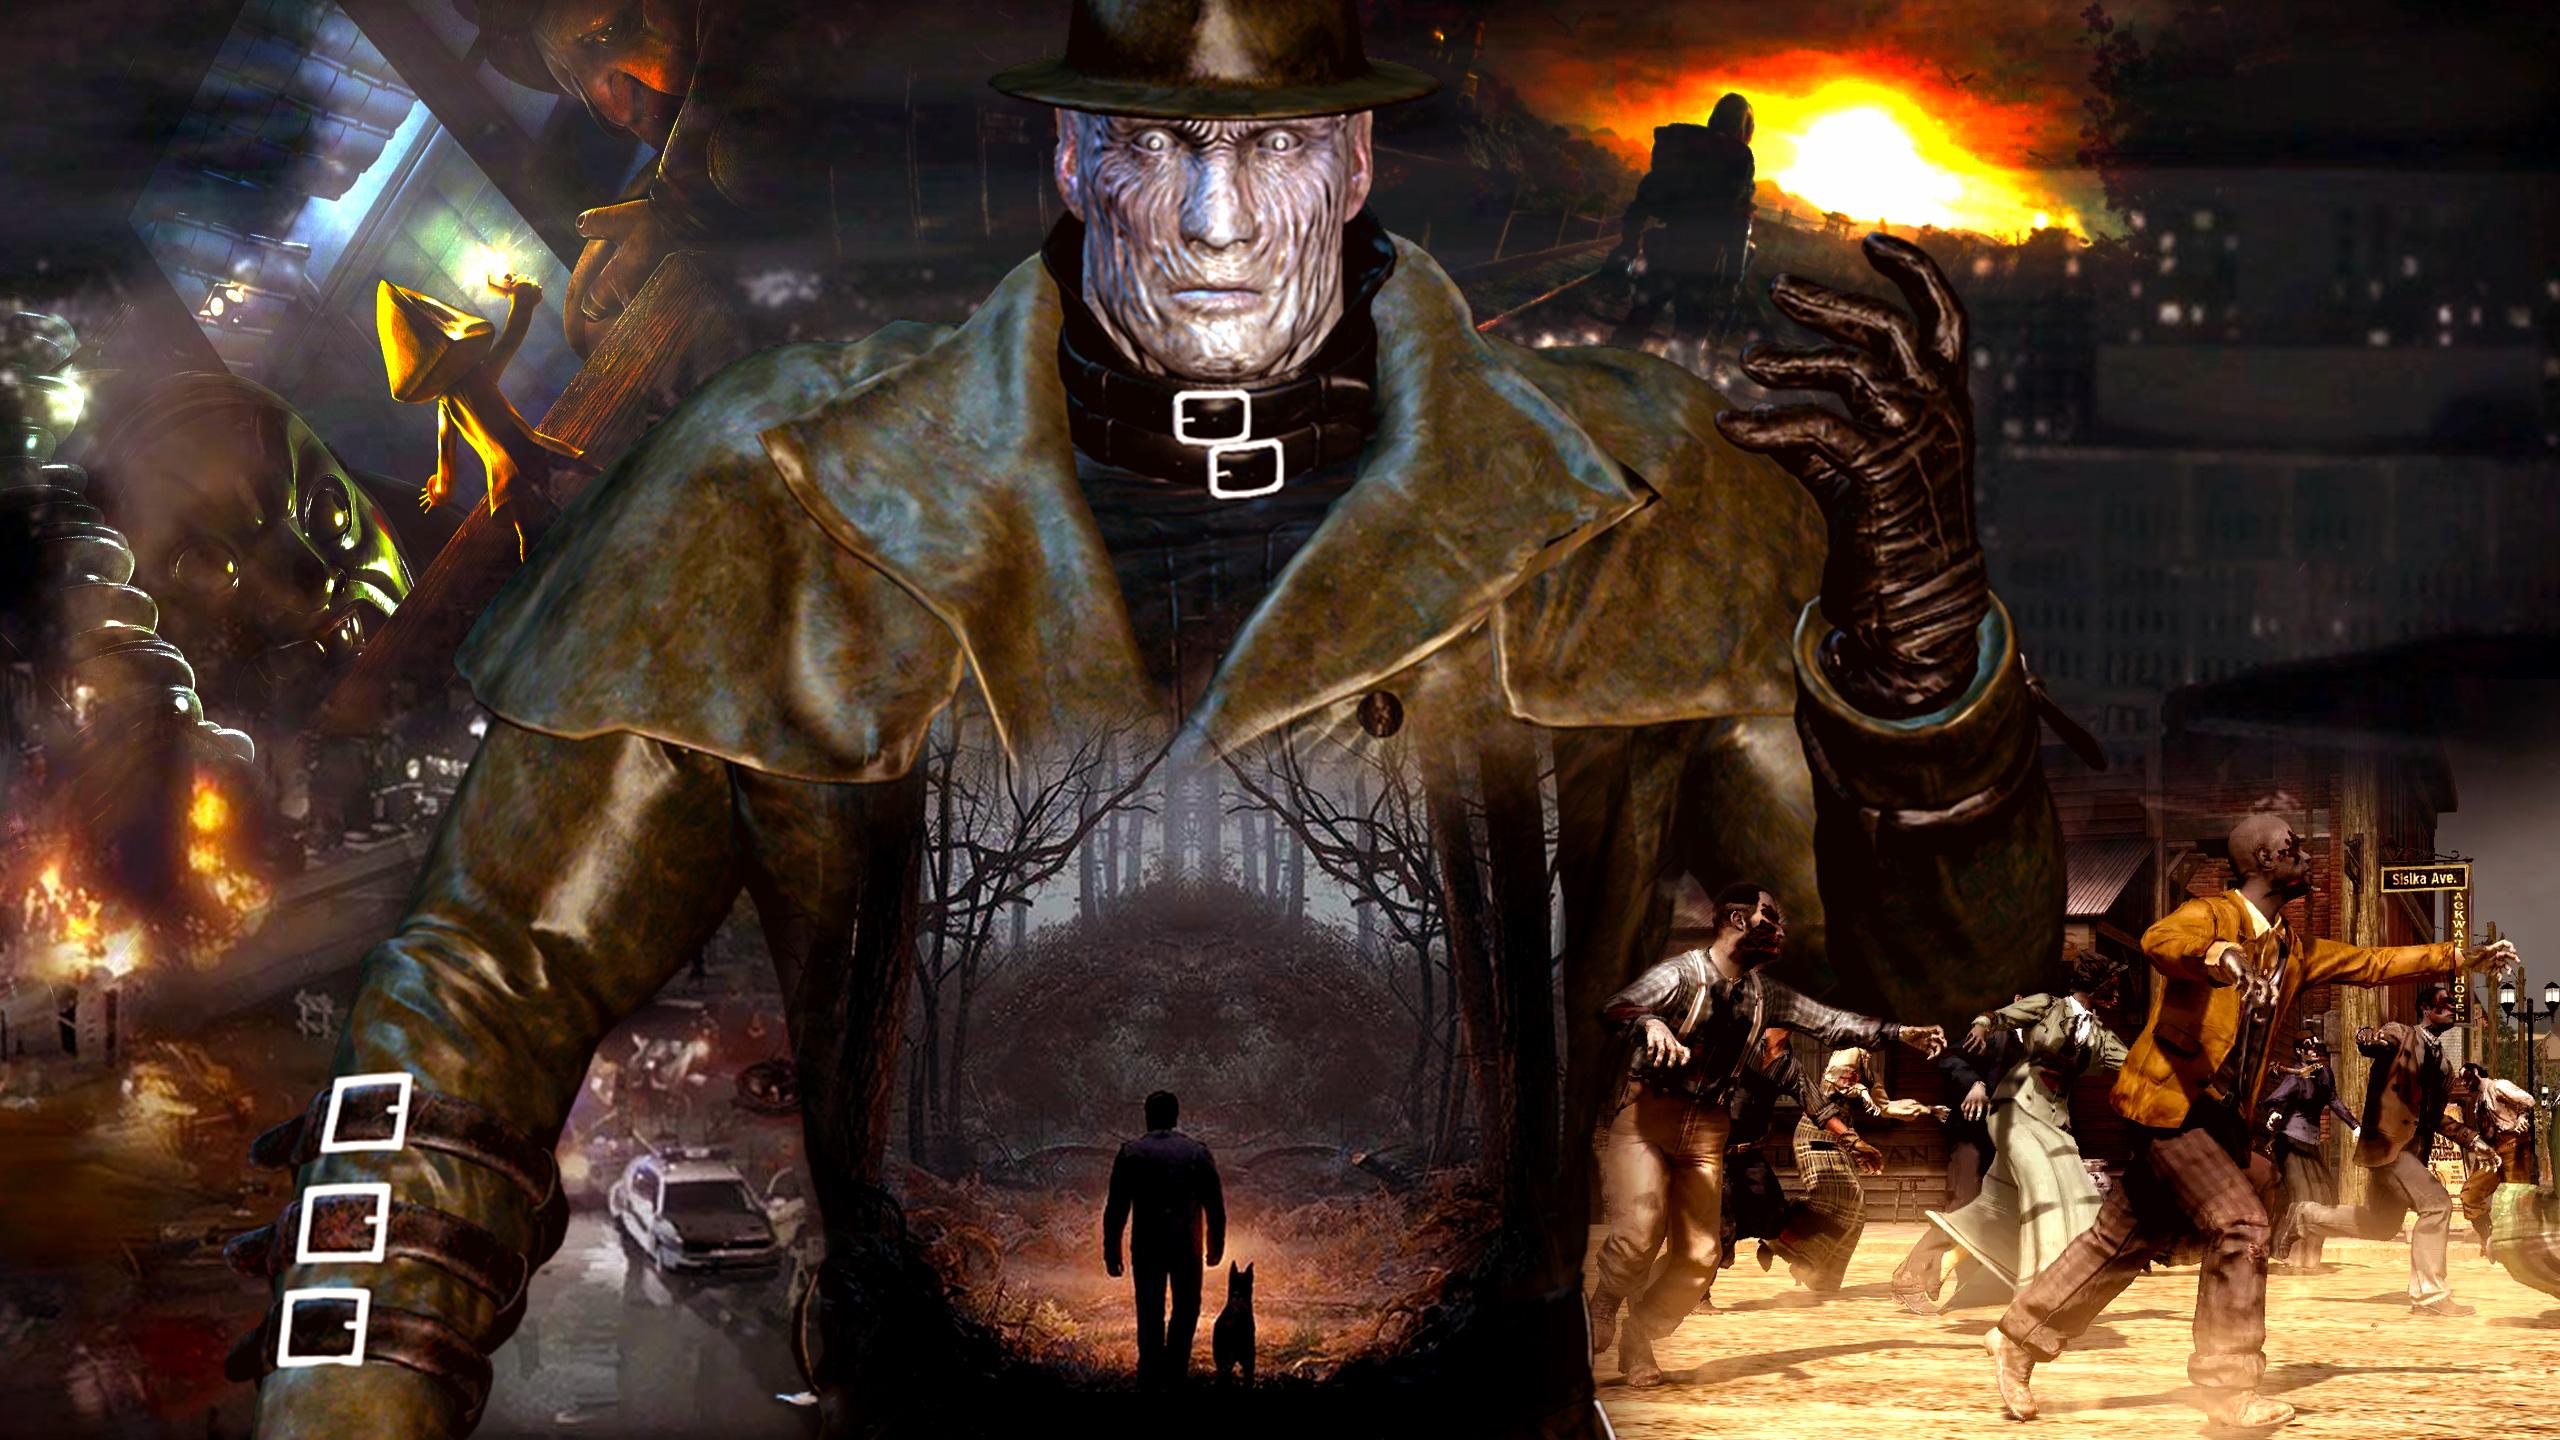 Resident Evil 2 Mr X - Можете ли вы убить тирана в Resident Evil 2?